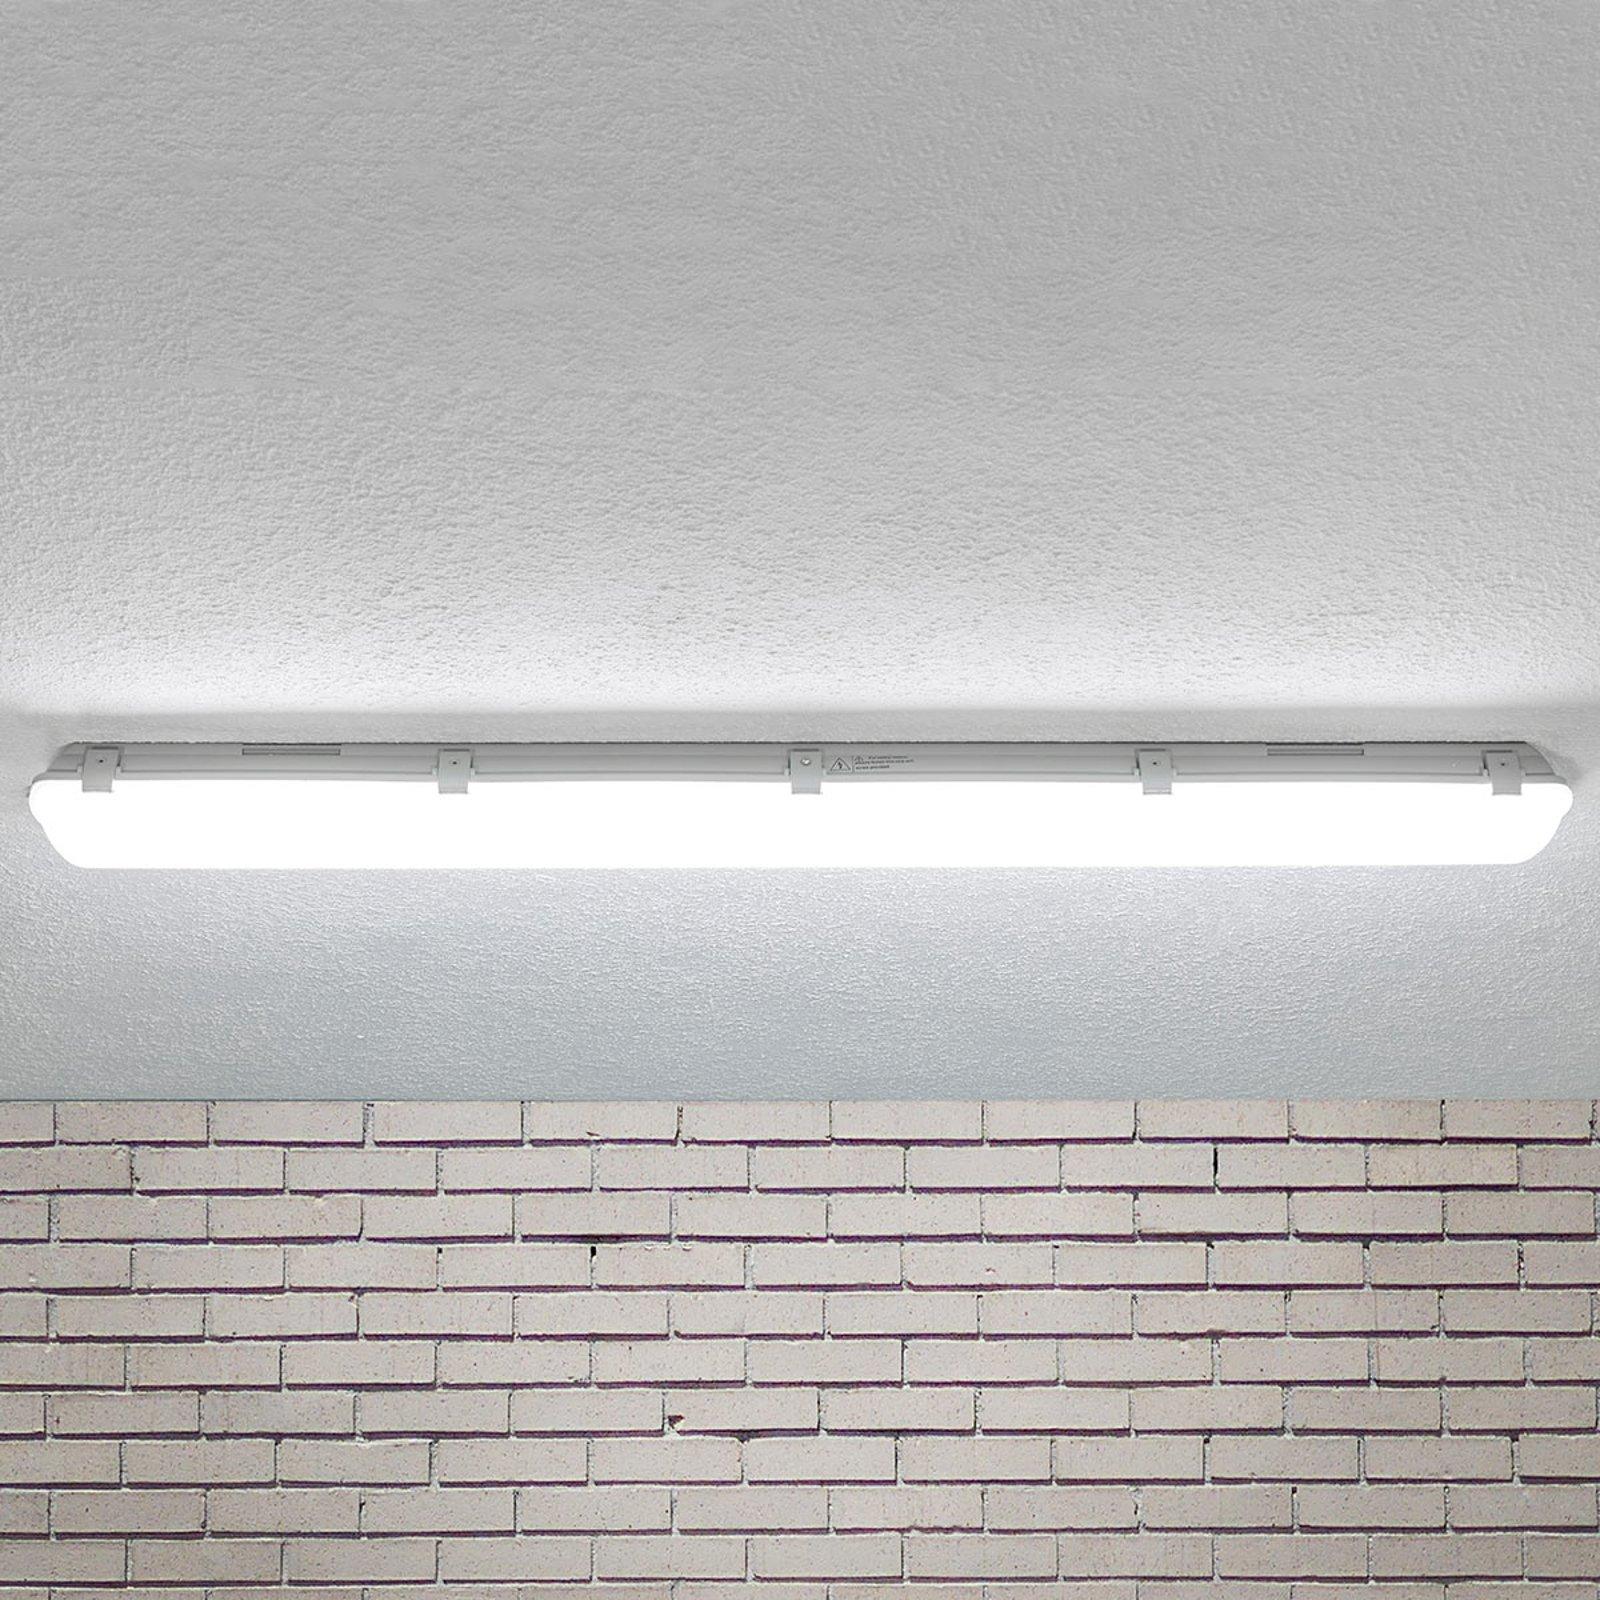 LED-taklampe Mareen IP65 34W 121,5cm